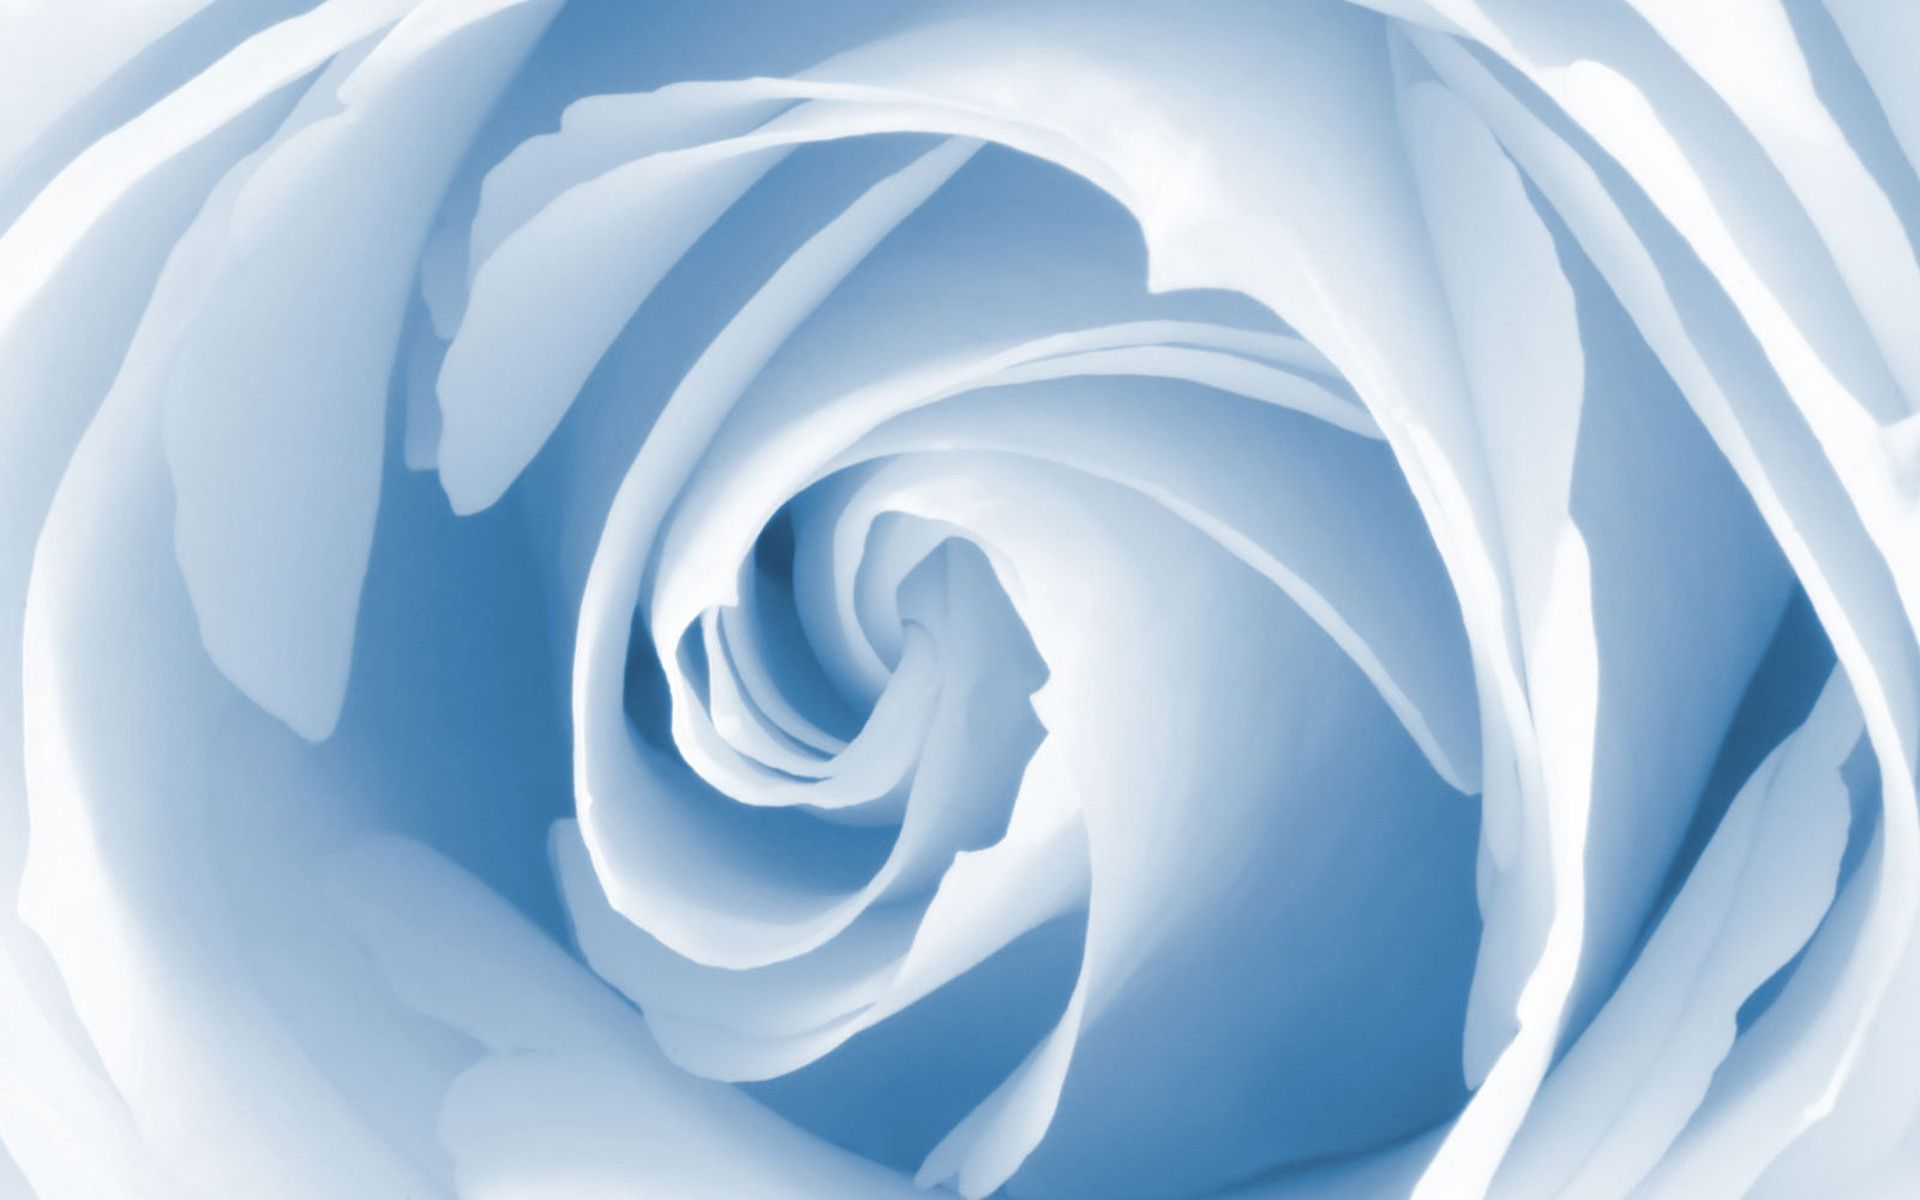 Miscellaneous Baby Blue Rose desktop wallpaper nr 58503 by maf04 1920x1200